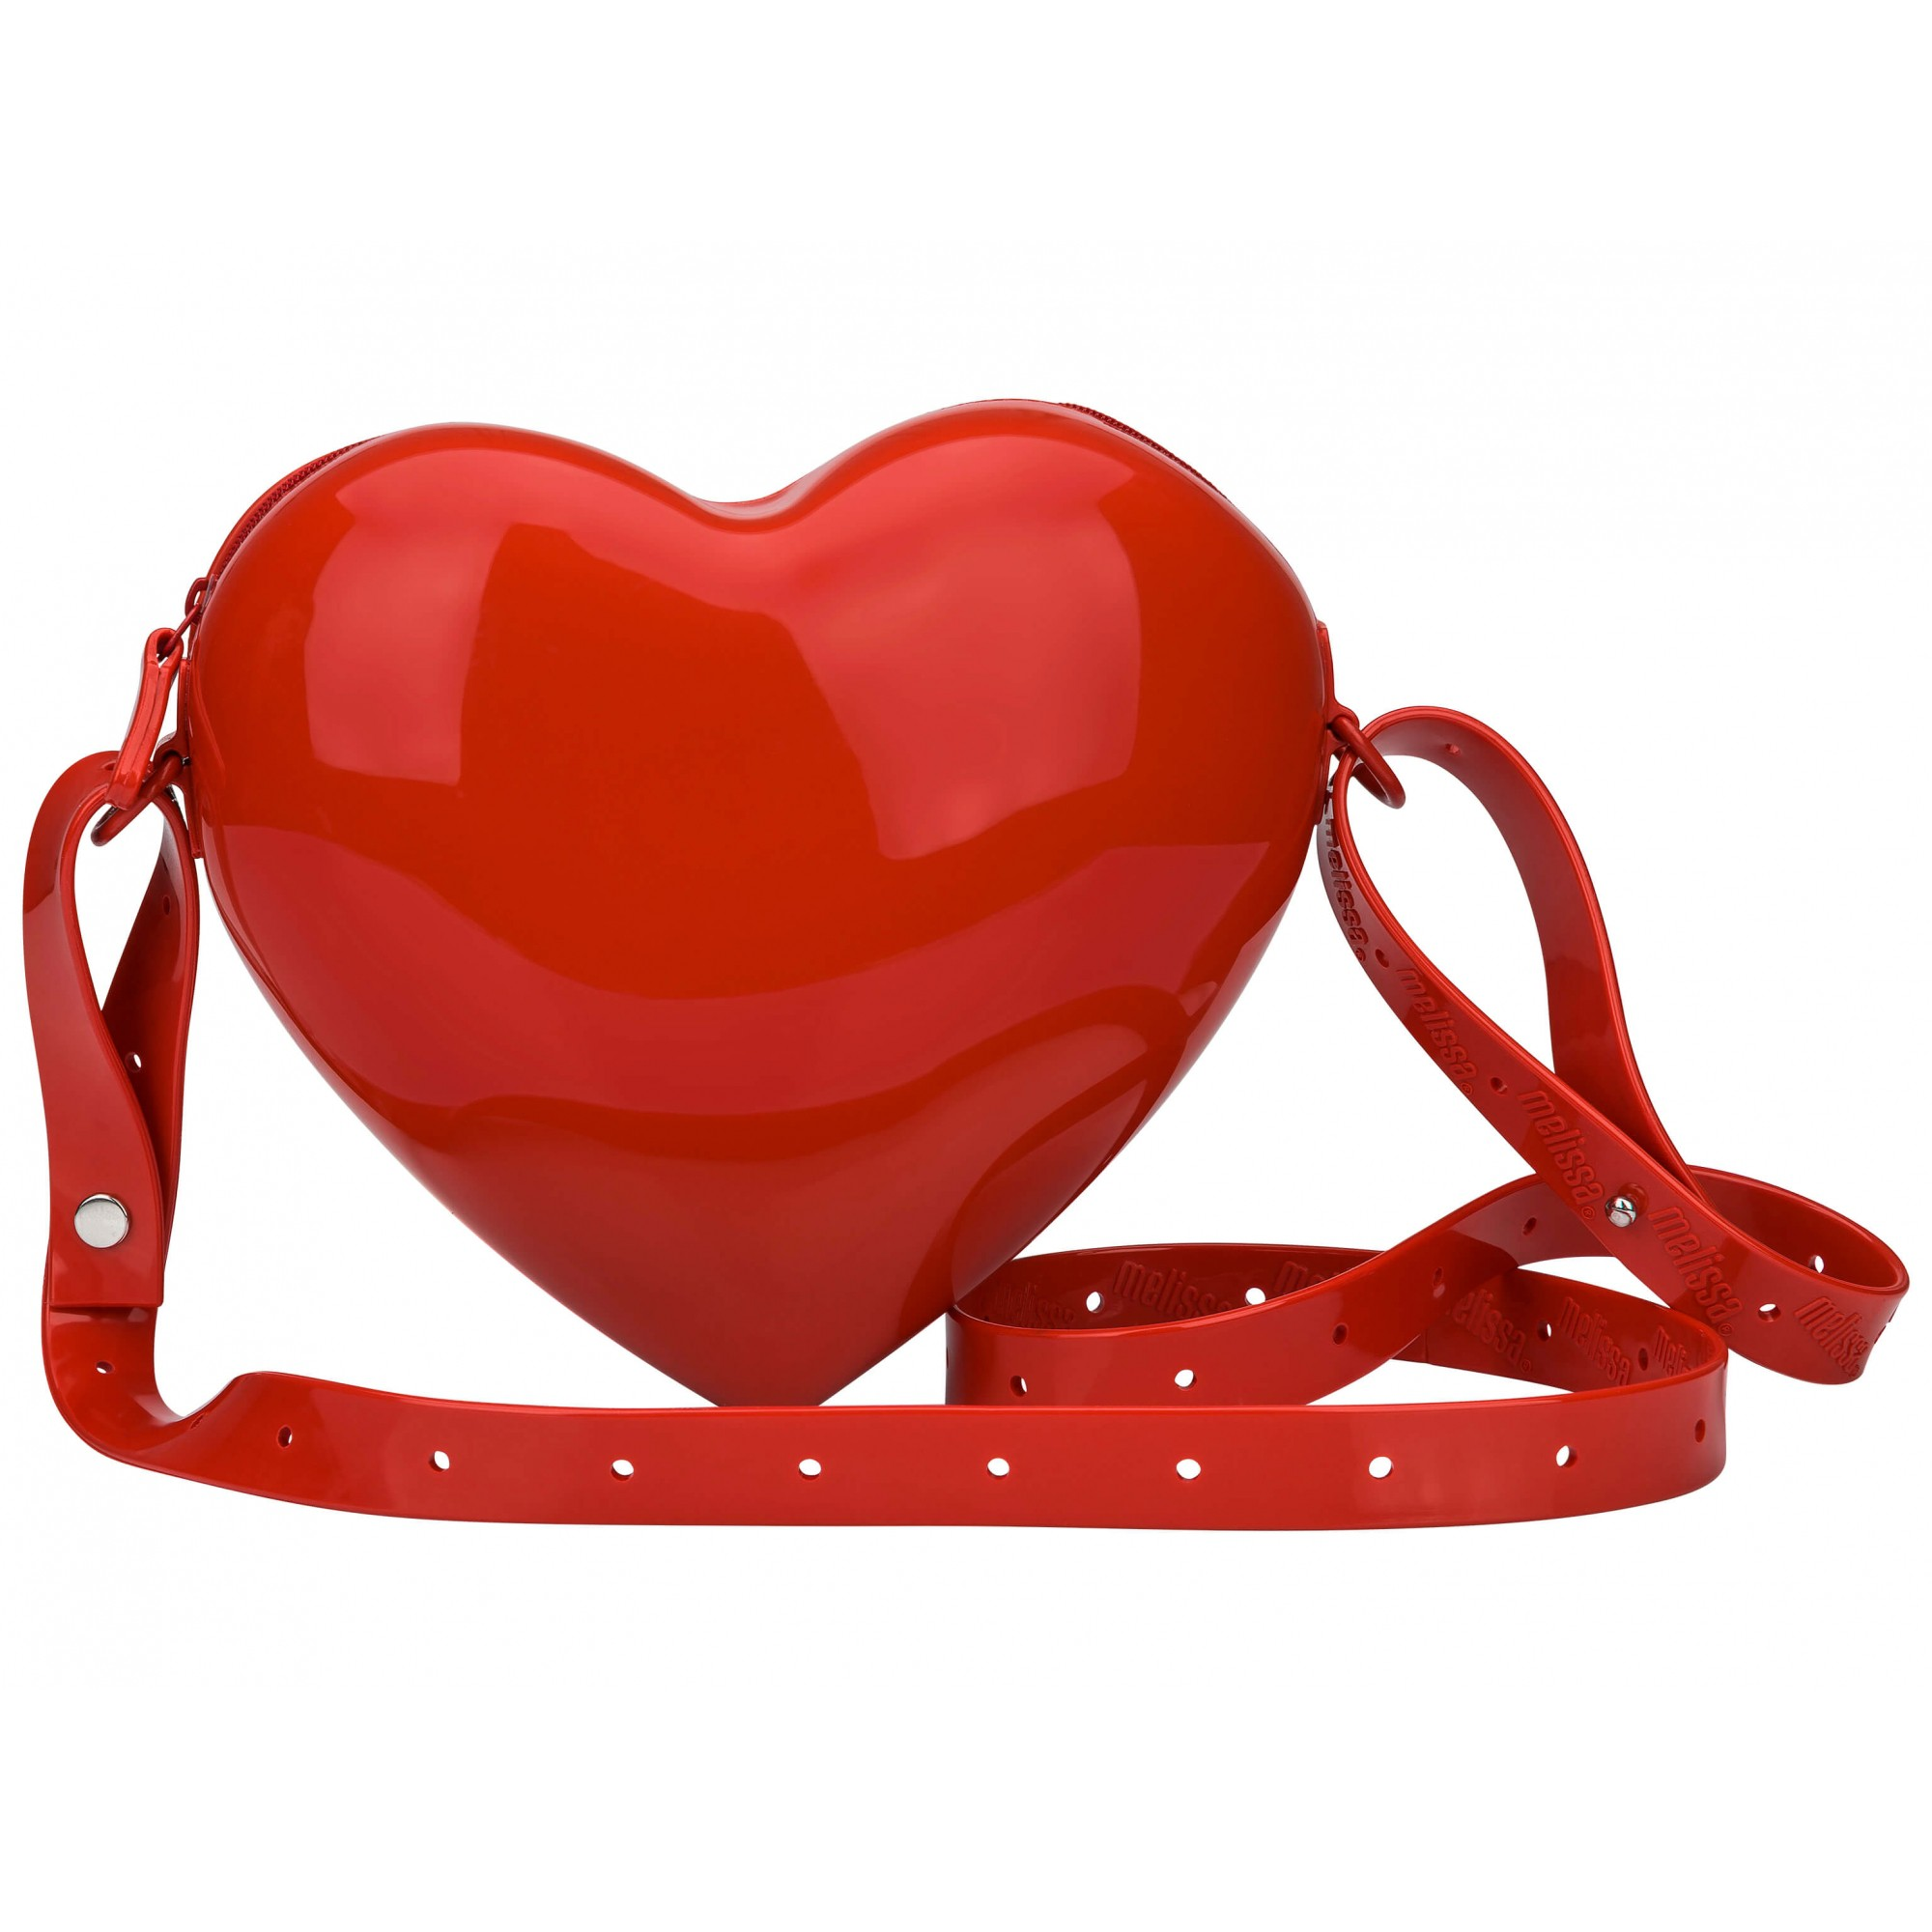 Melissa Love Bag  - Choque Concept